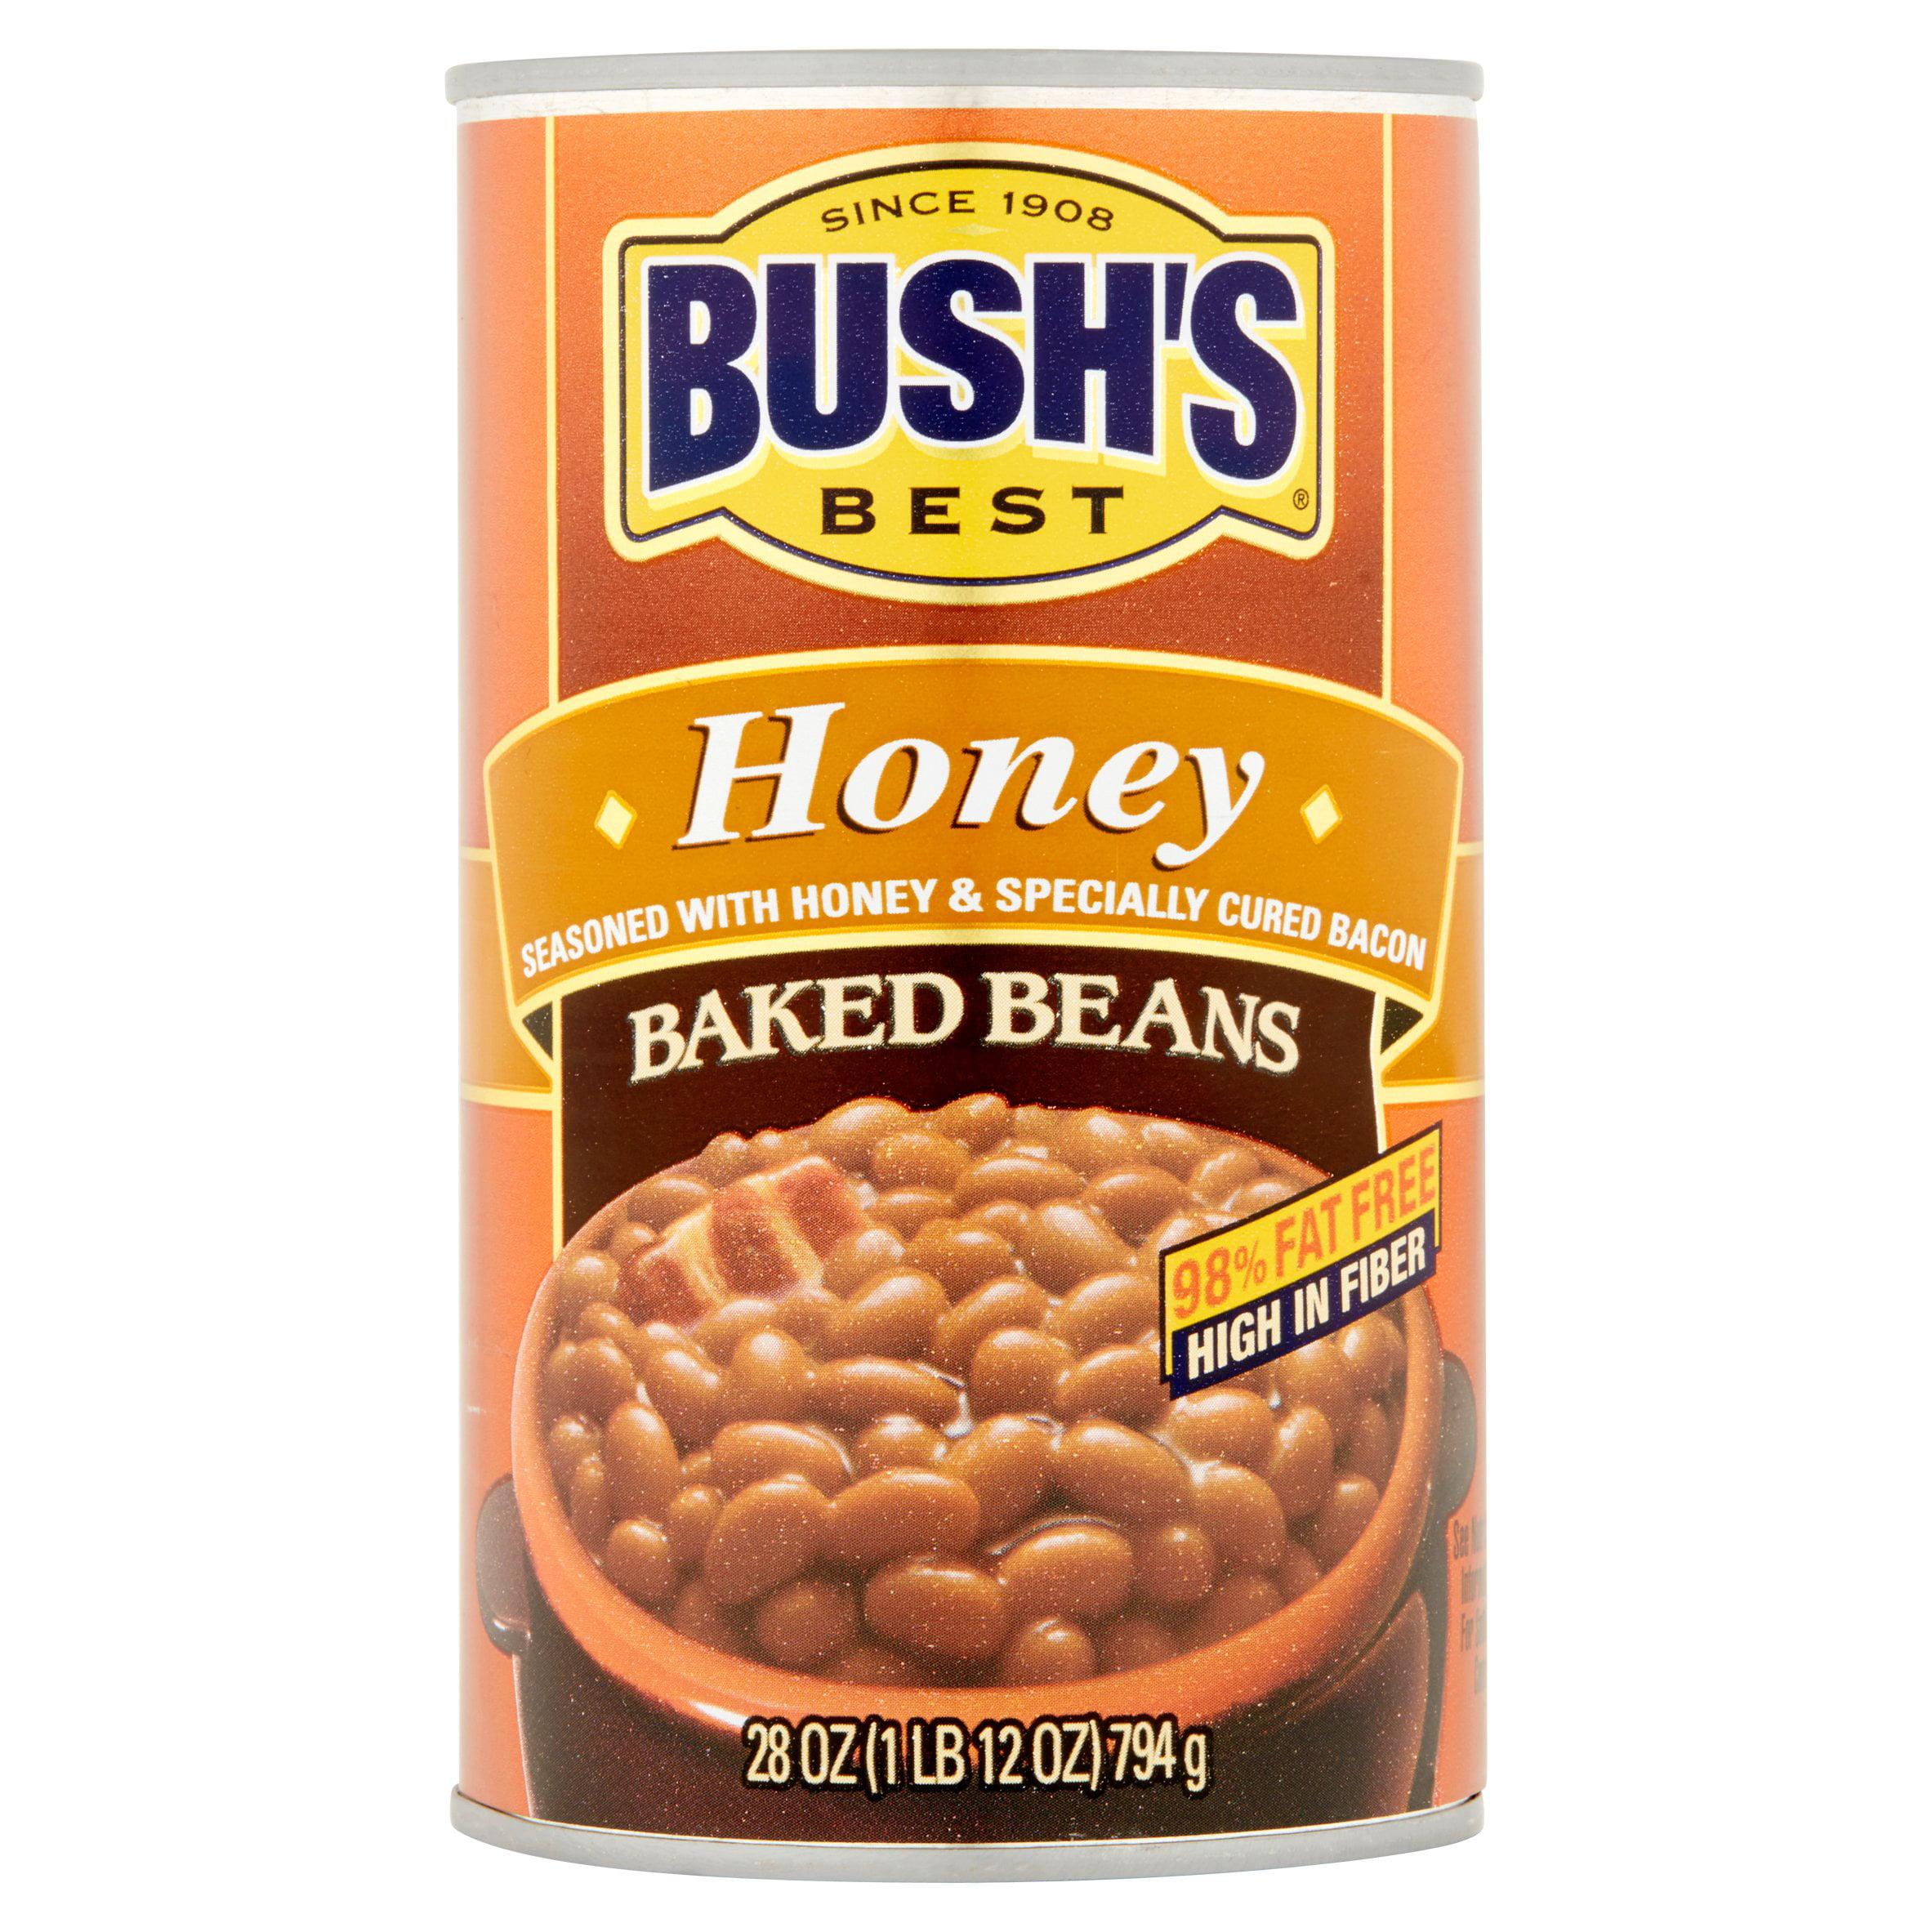 BUSH'S BEST Honey Baked Beans, 28.0 OZ by Bush Brothers & Company